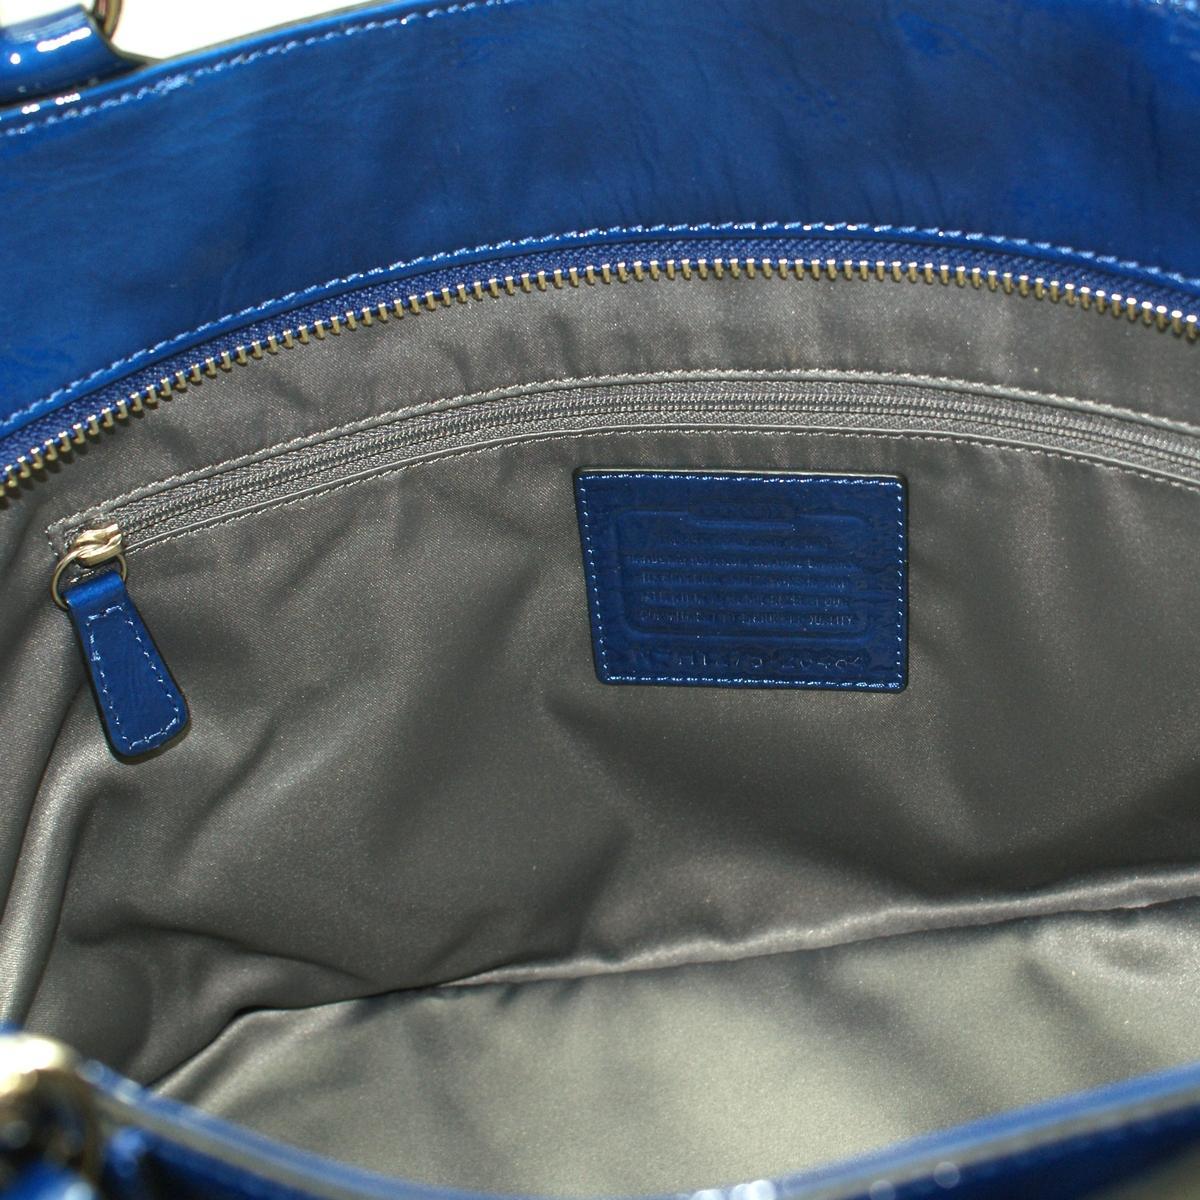 coach gray patent leather handbag iqiq  Coach Madison Patent Leather Tote Ultramarine 20484